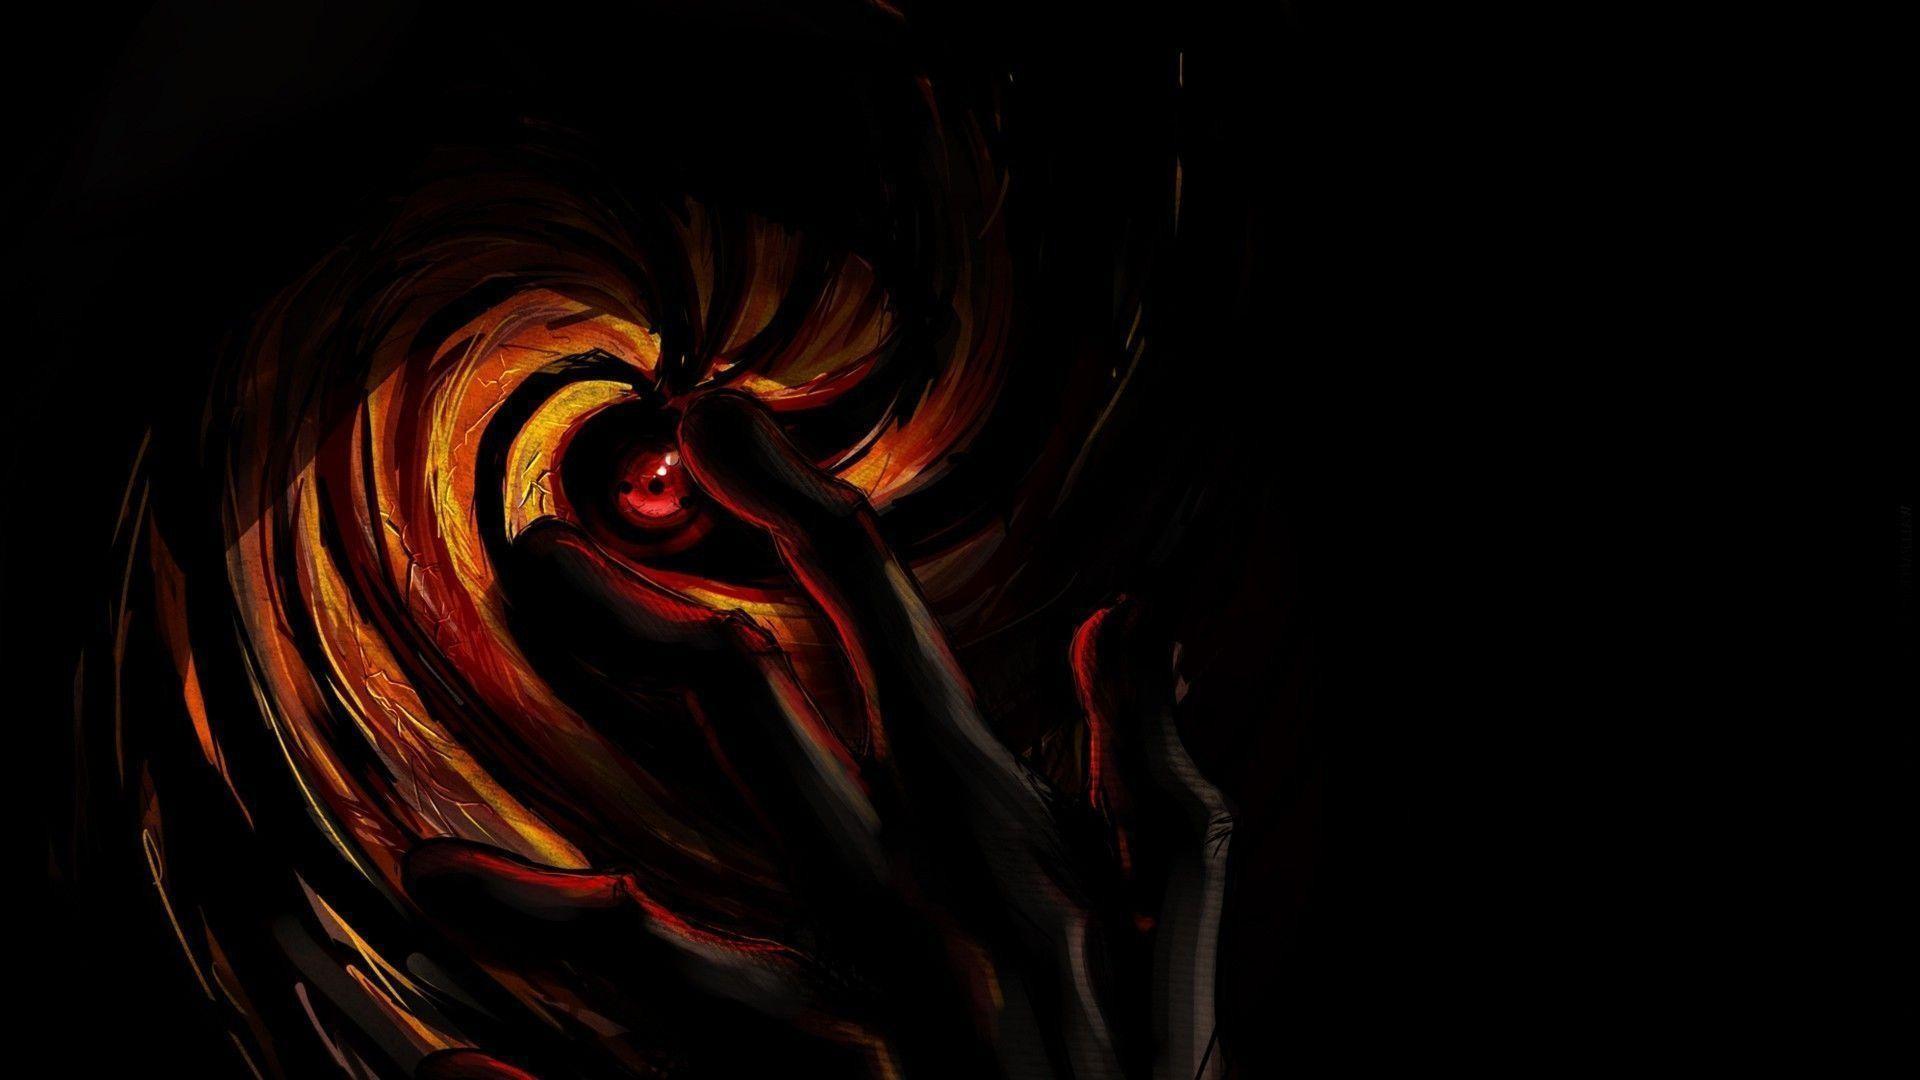 Obito Uchiha – Naruto wallpaper – Free Wide HD Wallpaper